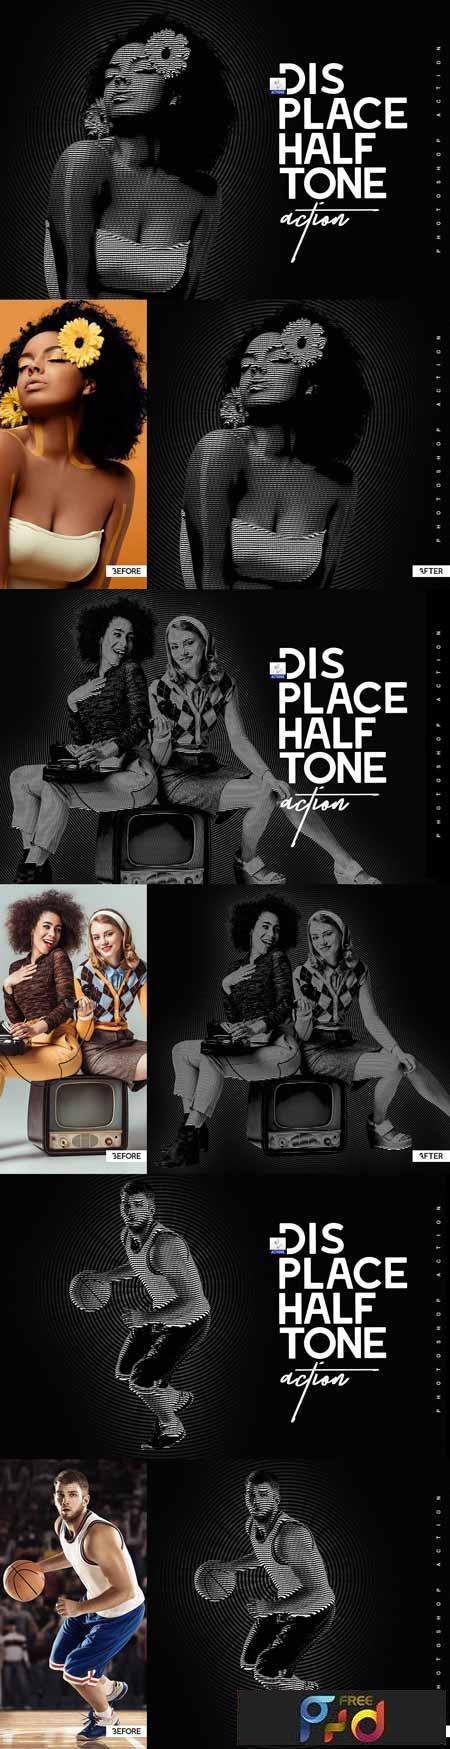 Displace Halftone 3304747 1